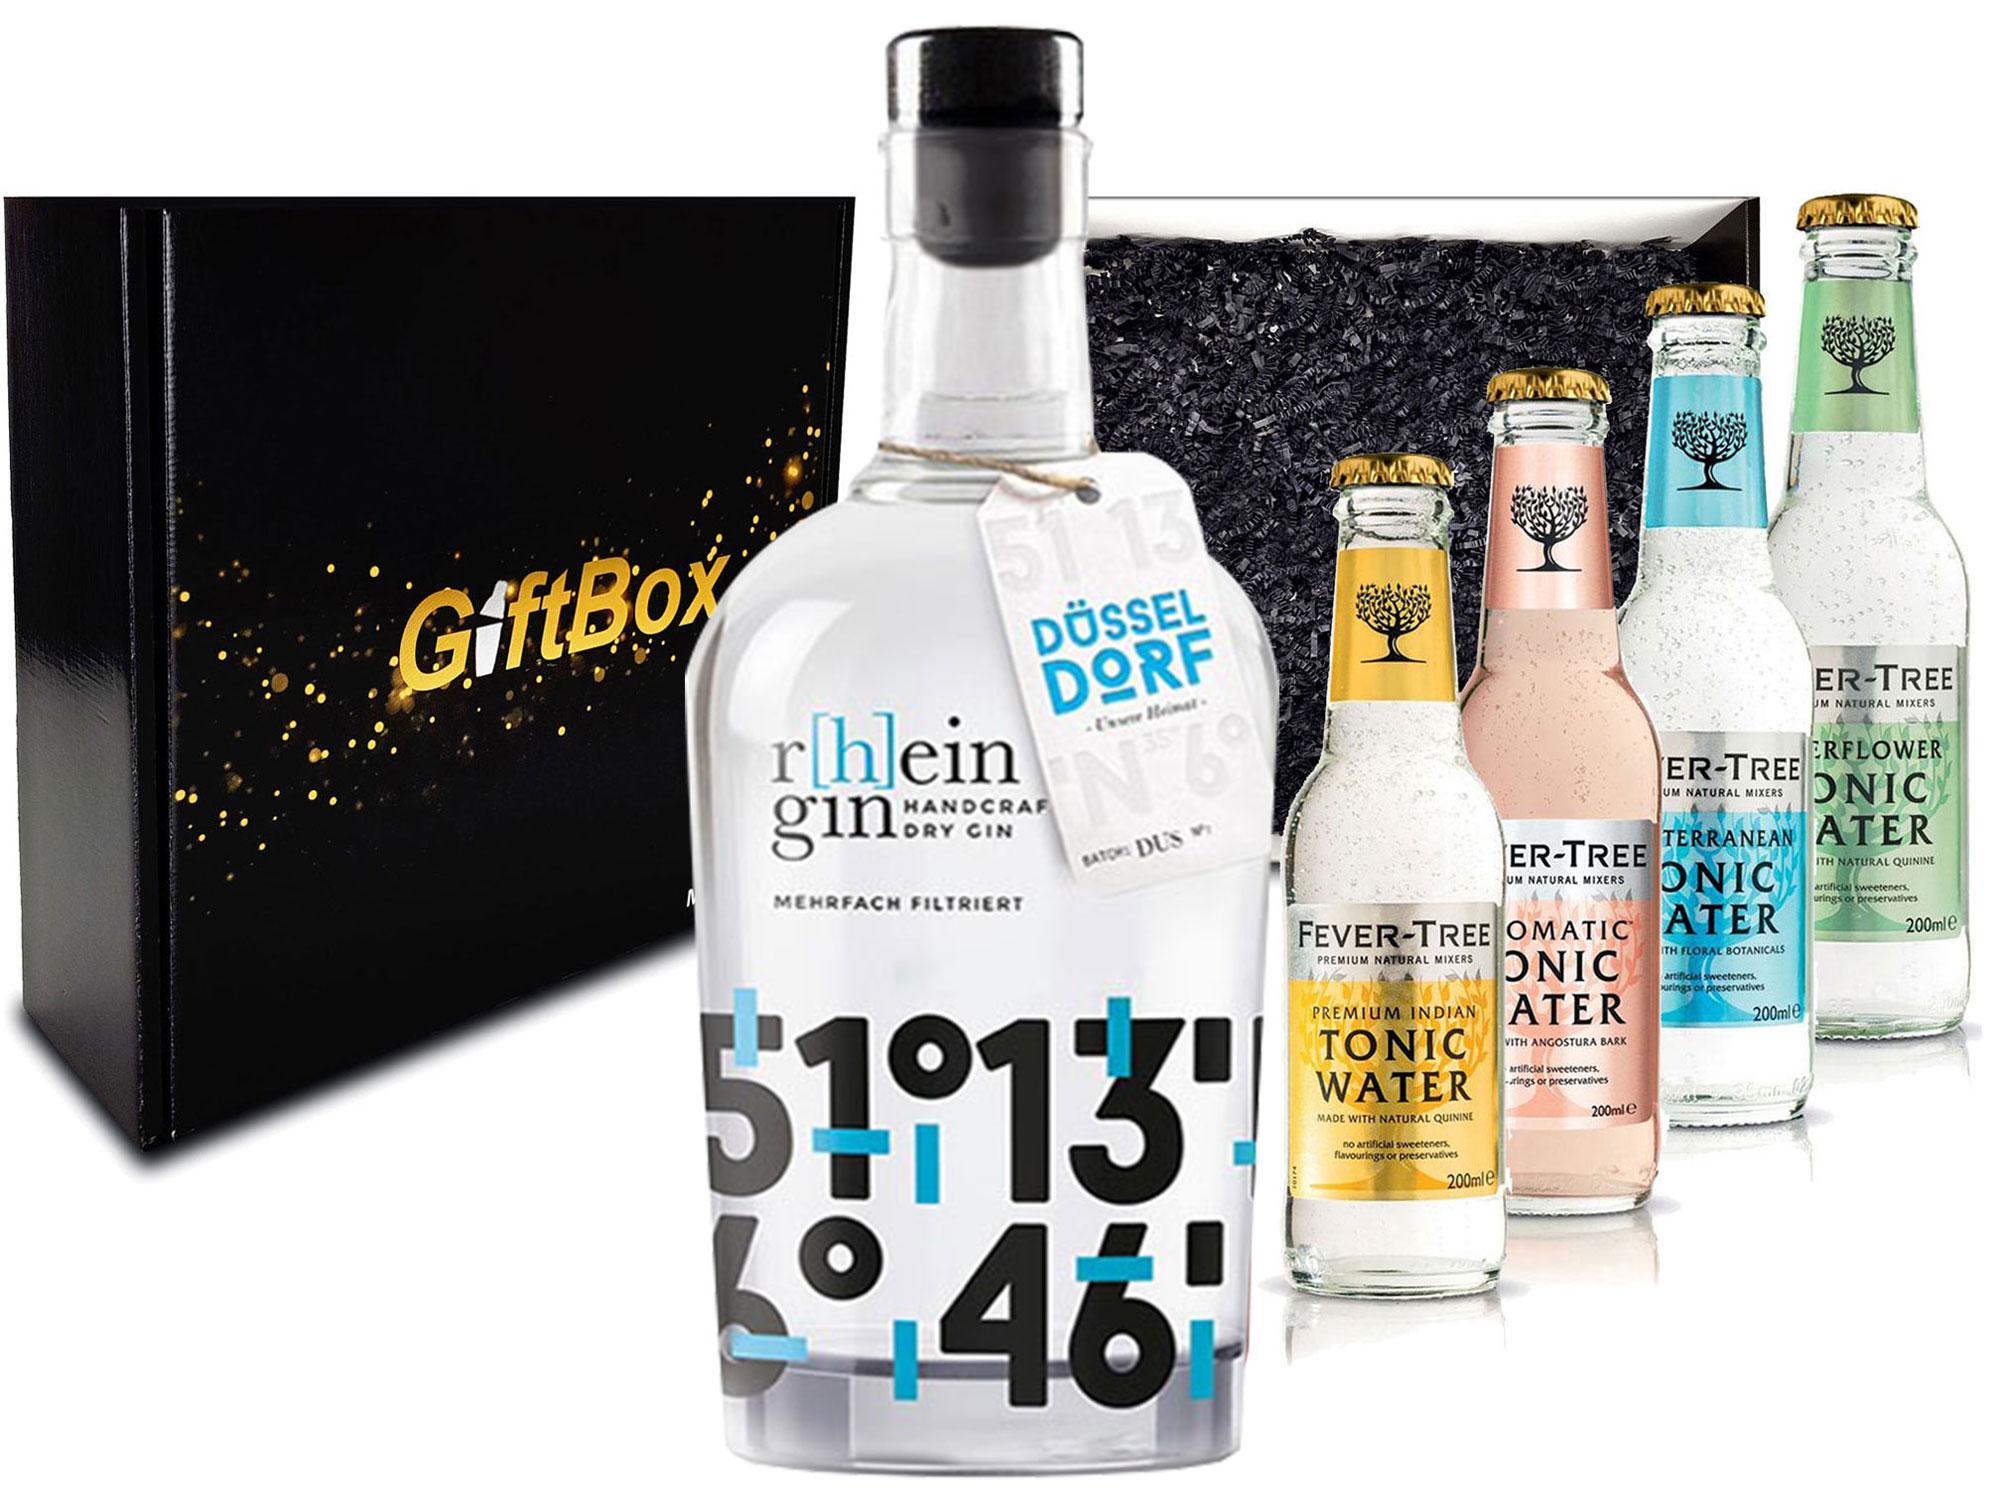 Gin Tonic Giftbox Geschenkset - r[h]eingin Handcrafted Dry Gin 0,5l 500ml (46% Vol) + 4x Fever Tree Tonic Water Mix verschiedene Sorten 200ml inkl. Pfand MEHRWEG Gin Tonic Bar - [Enthält Sulfite]